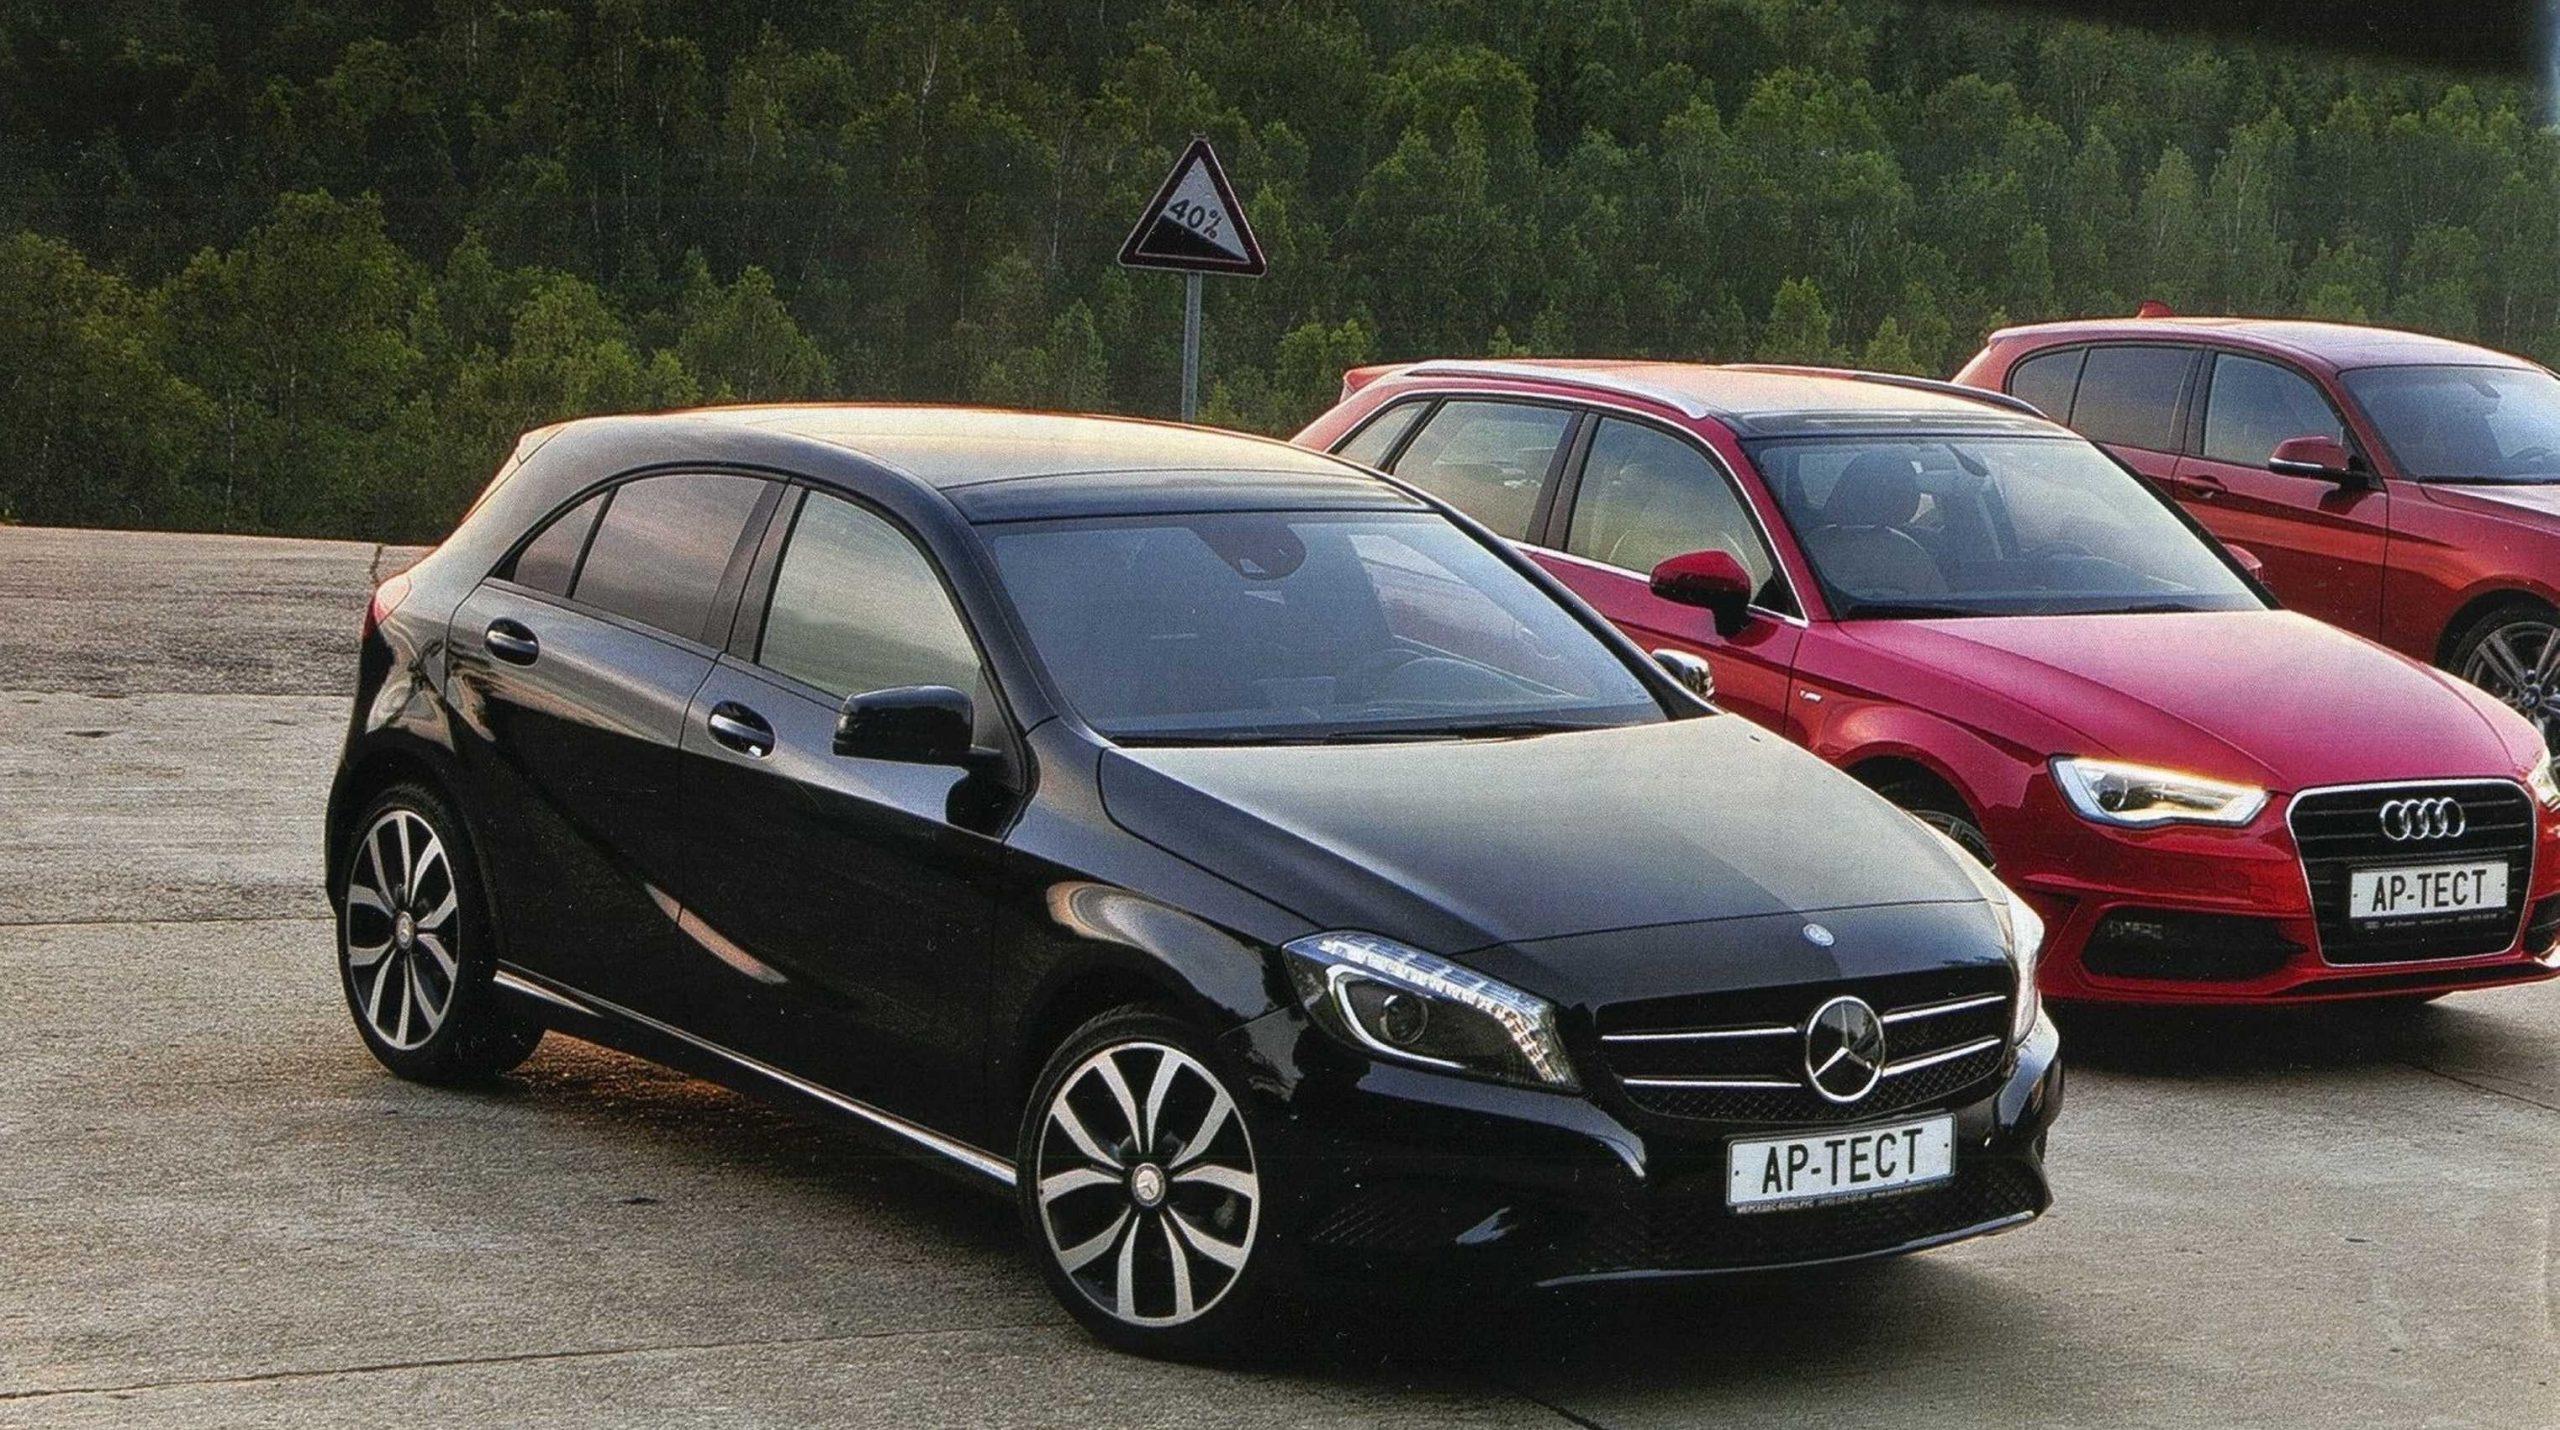 BMW 118i, Volvo V40 Cross Country T4 и Audi A3 Sportback 1.8 TFSI, Mercedes-Benz A 200